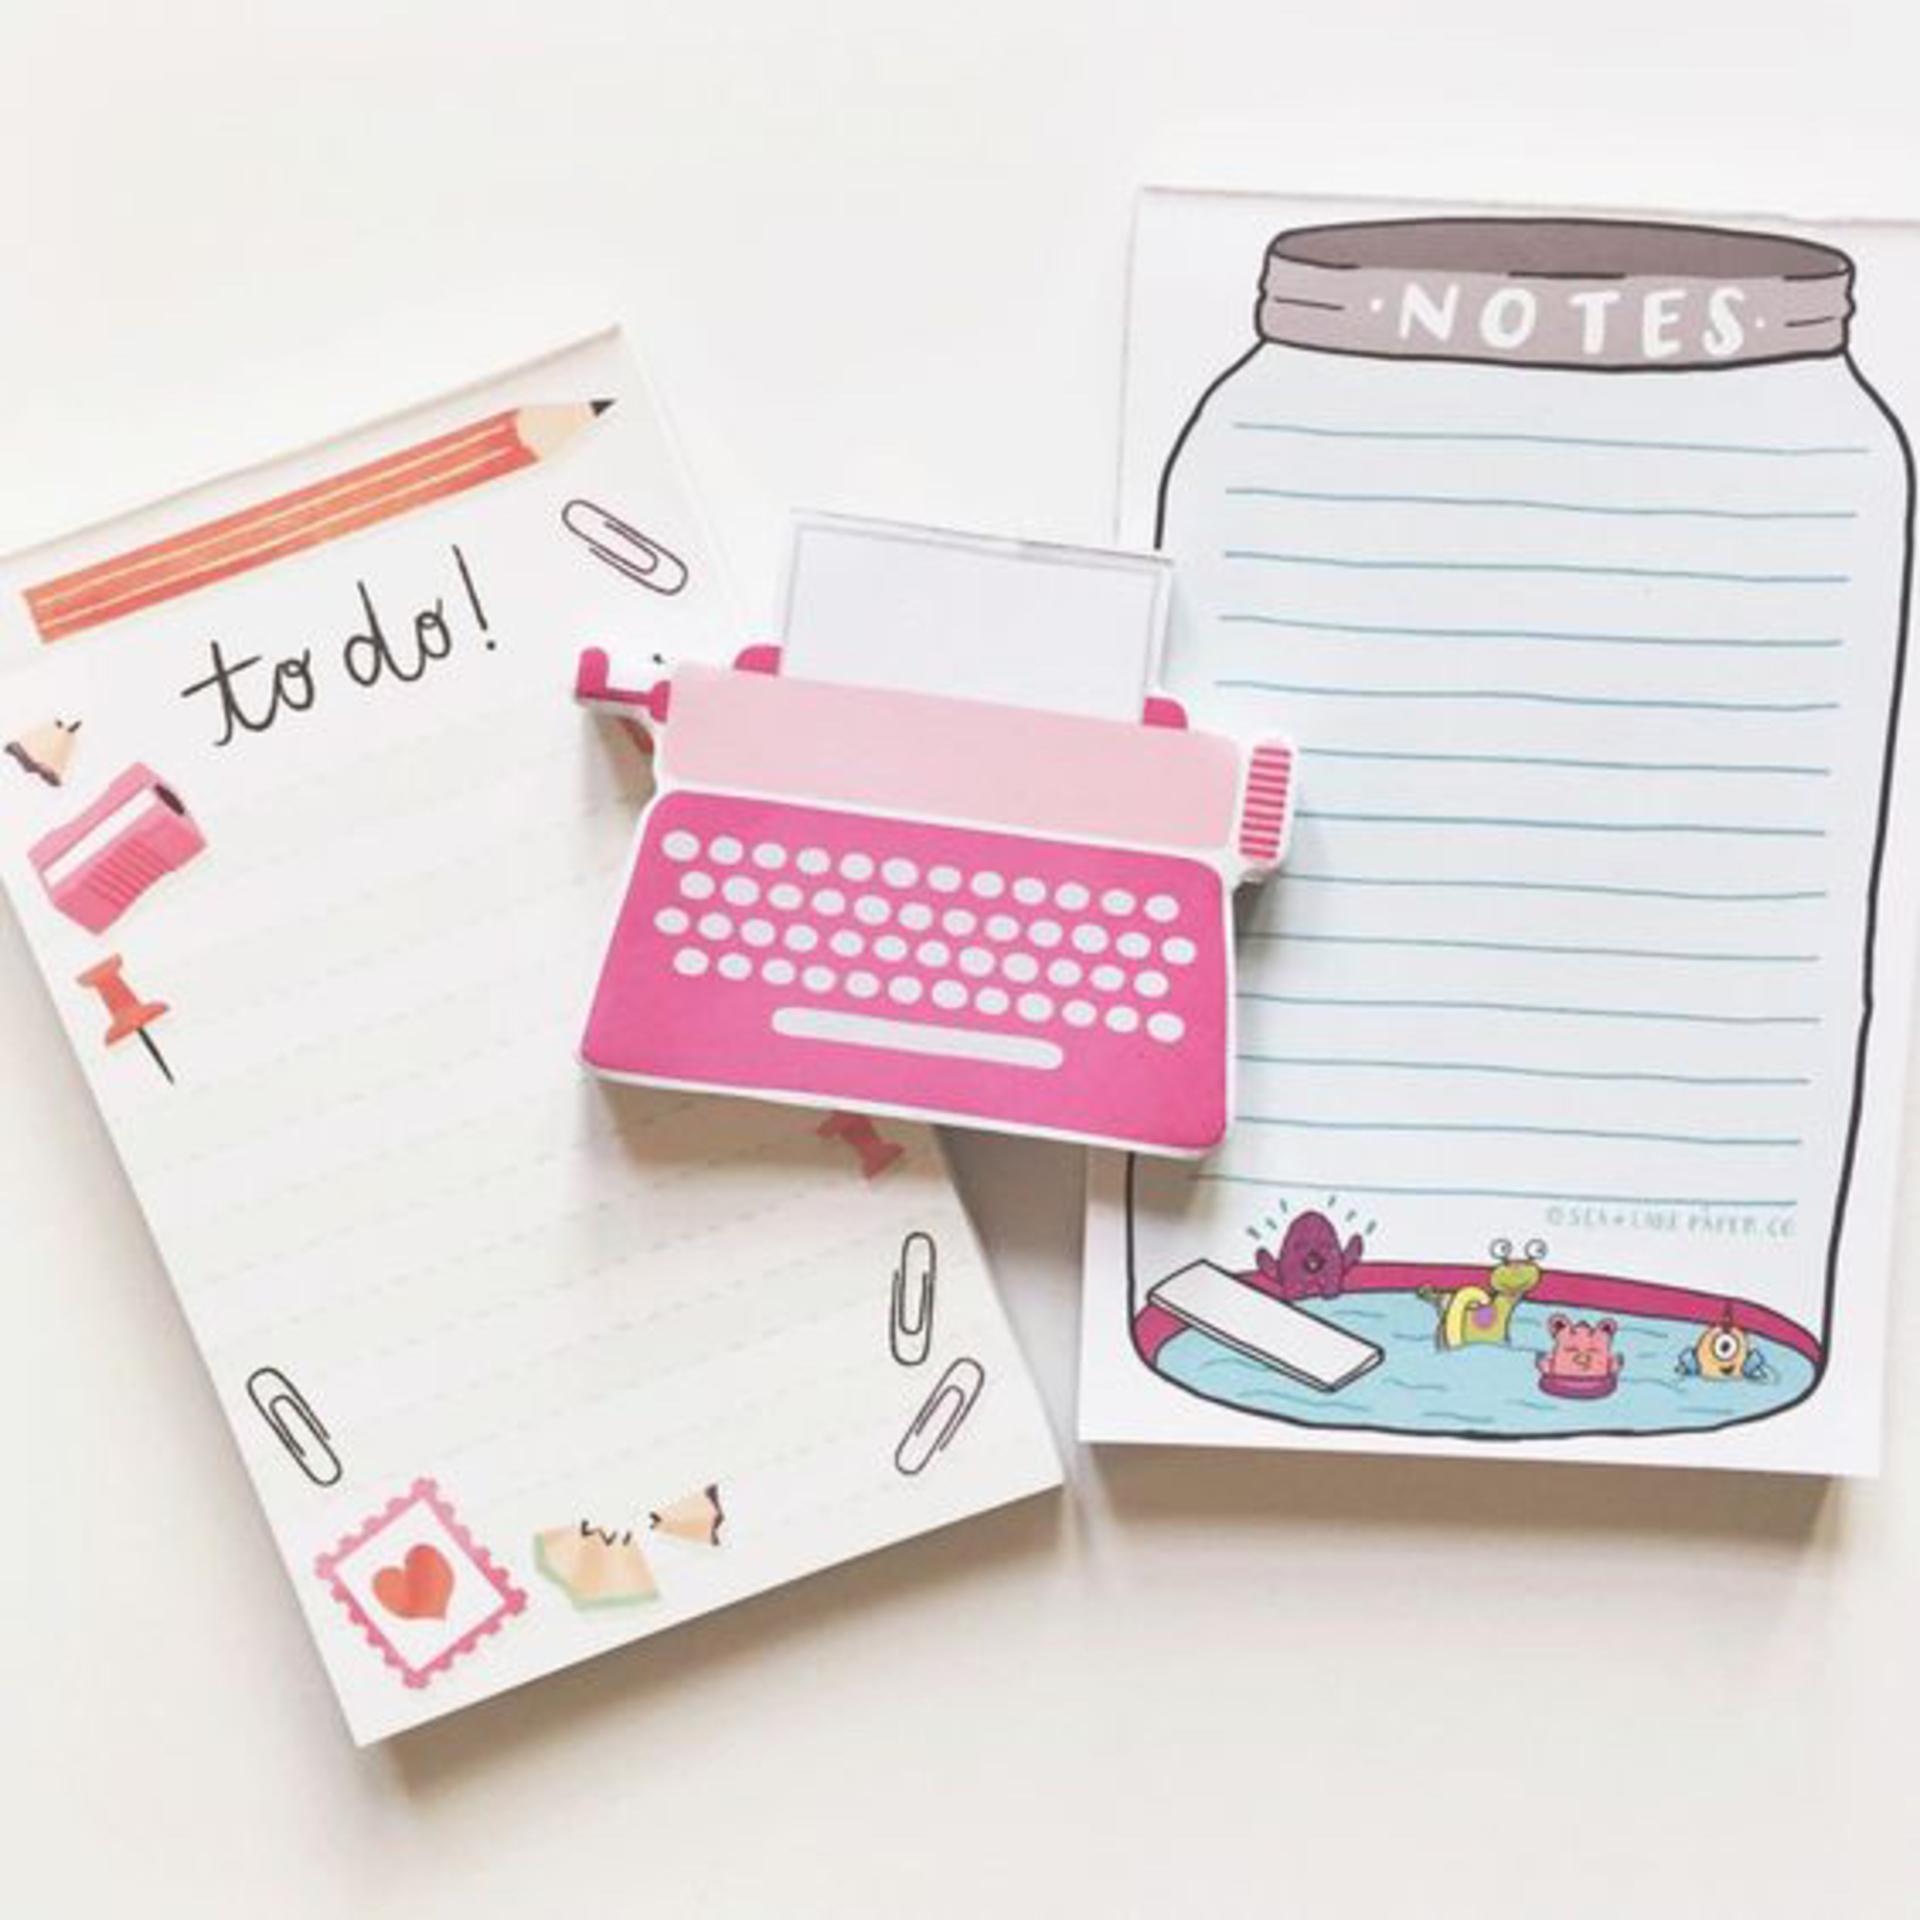 Rachel's Blog - ce70f63913deed02c0a9ad3d55de58cf